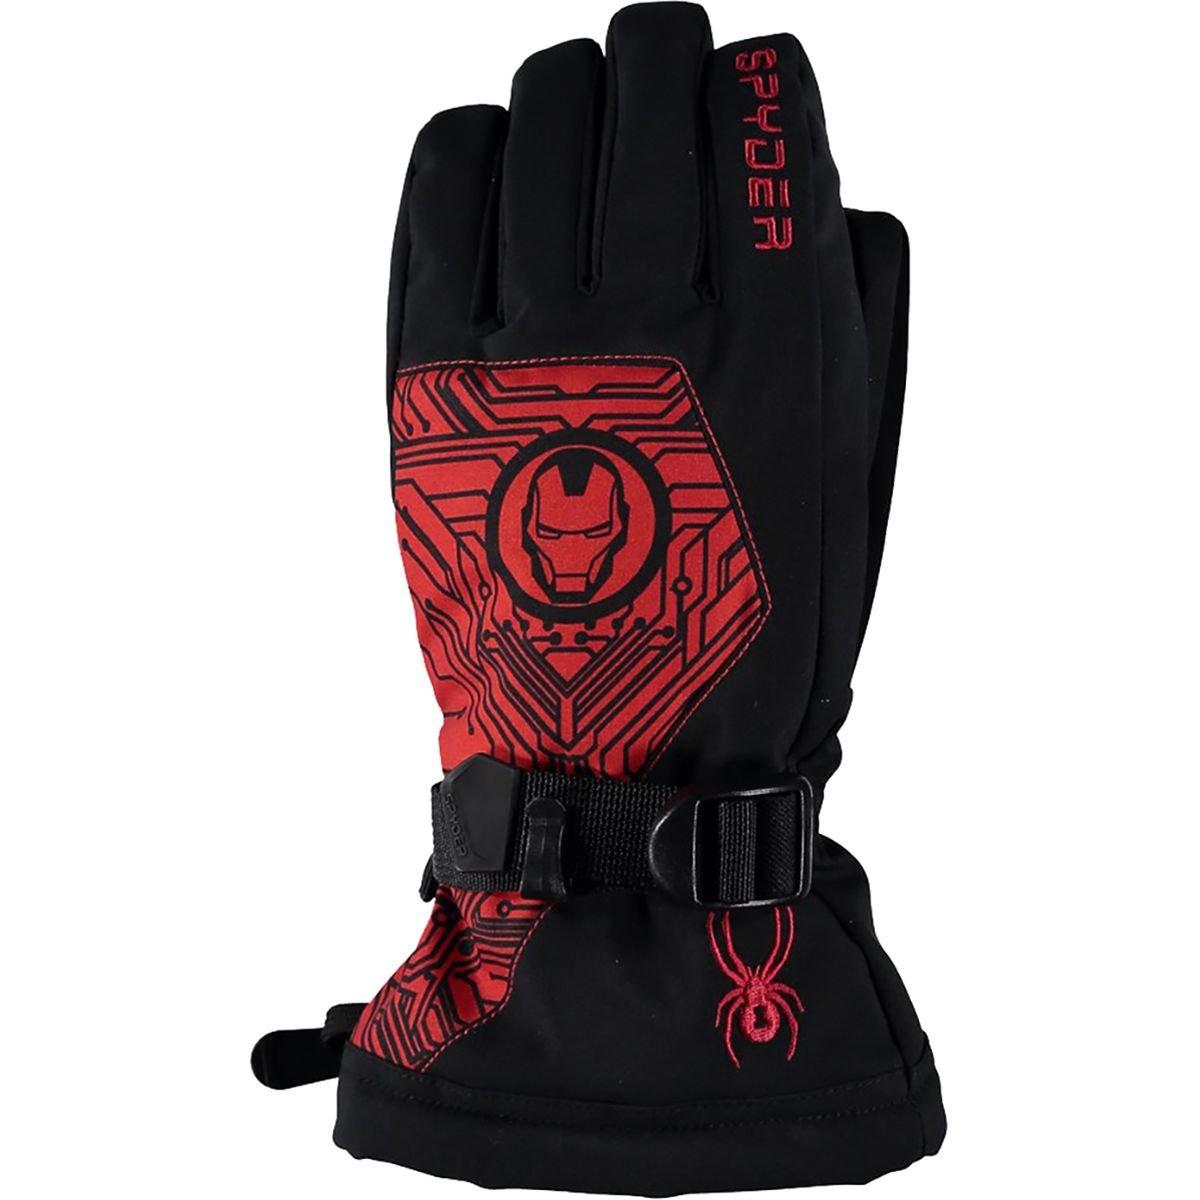 Spyder Boy's Marvel Overweb Ski Glove, Black/Ironman, Large